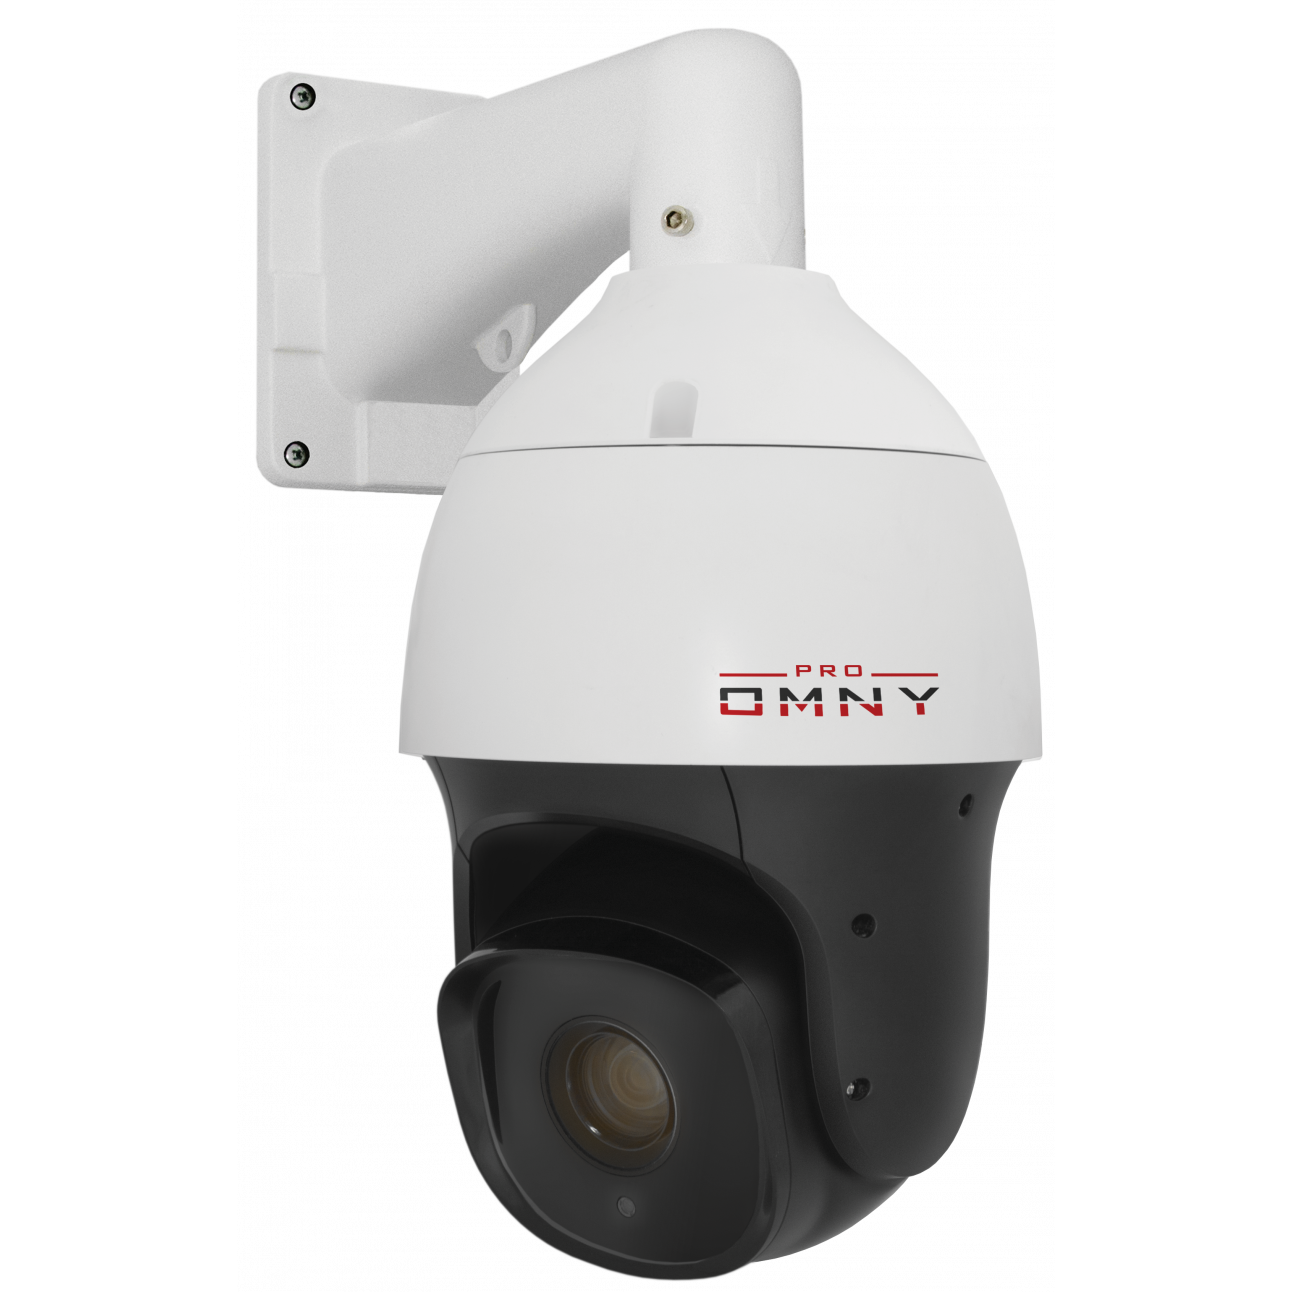 Поворотная камера IP 2.0Мп  с 20х оптическим увеличением c ИК подсветкой, наст. кронтш  в комплекте, 100BASE-X, 24VAC